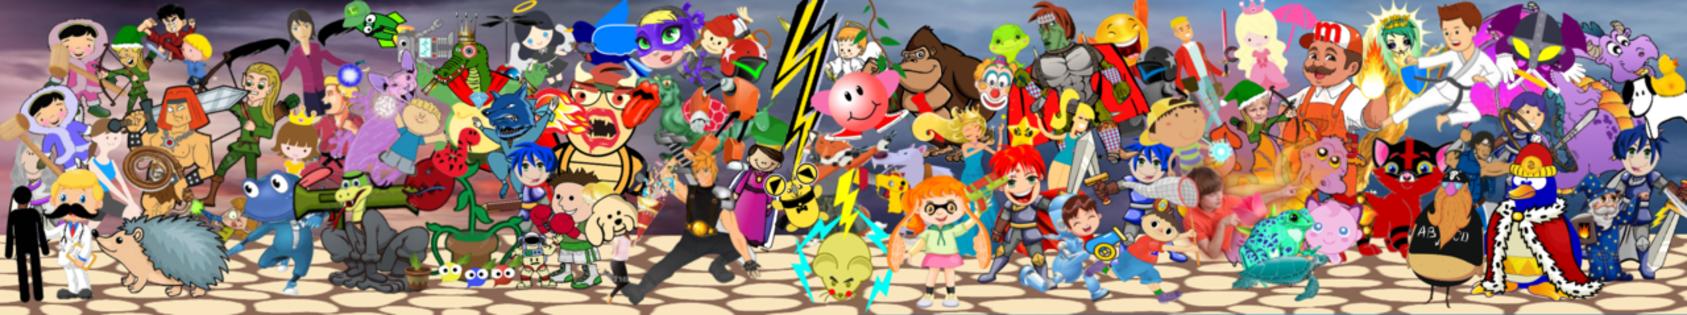 Smash ultimate cliparts image Super Smash Brothers Ultimate Mural Clipart Version | Super ... image